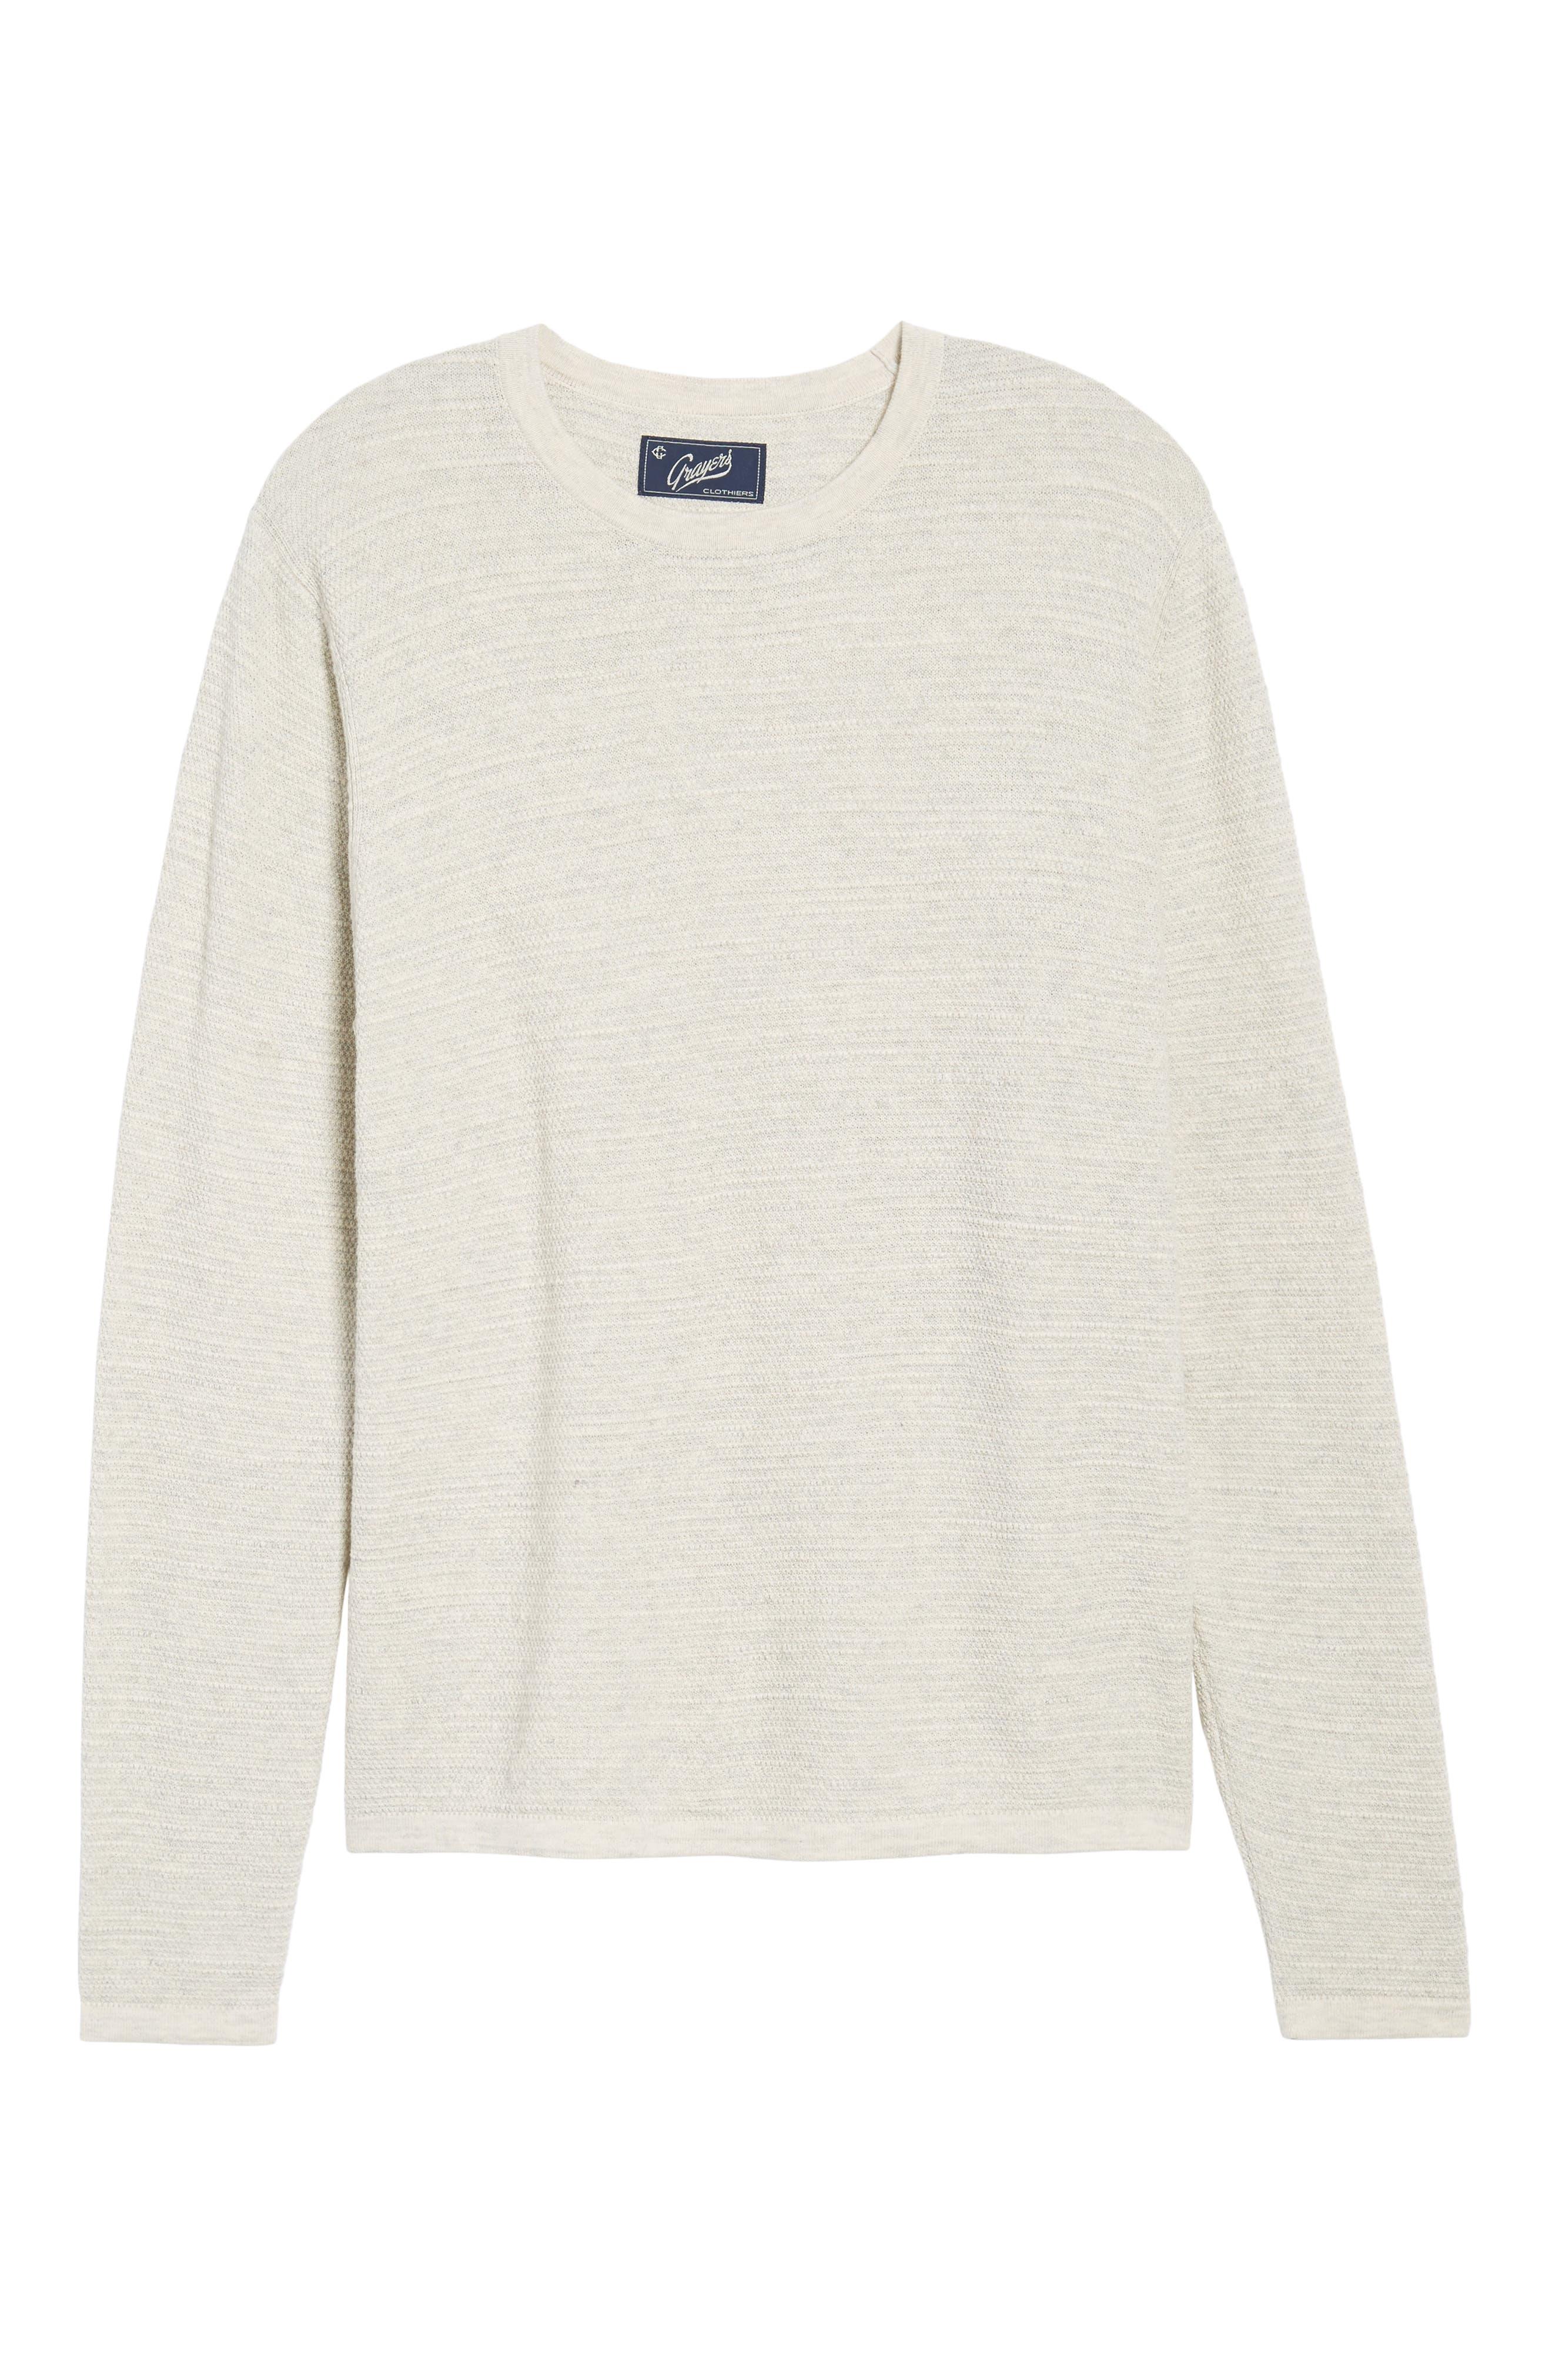 Slub Thermal Knit Sweater,                             Alternate thumbnail 6, color,                             Cream Heather